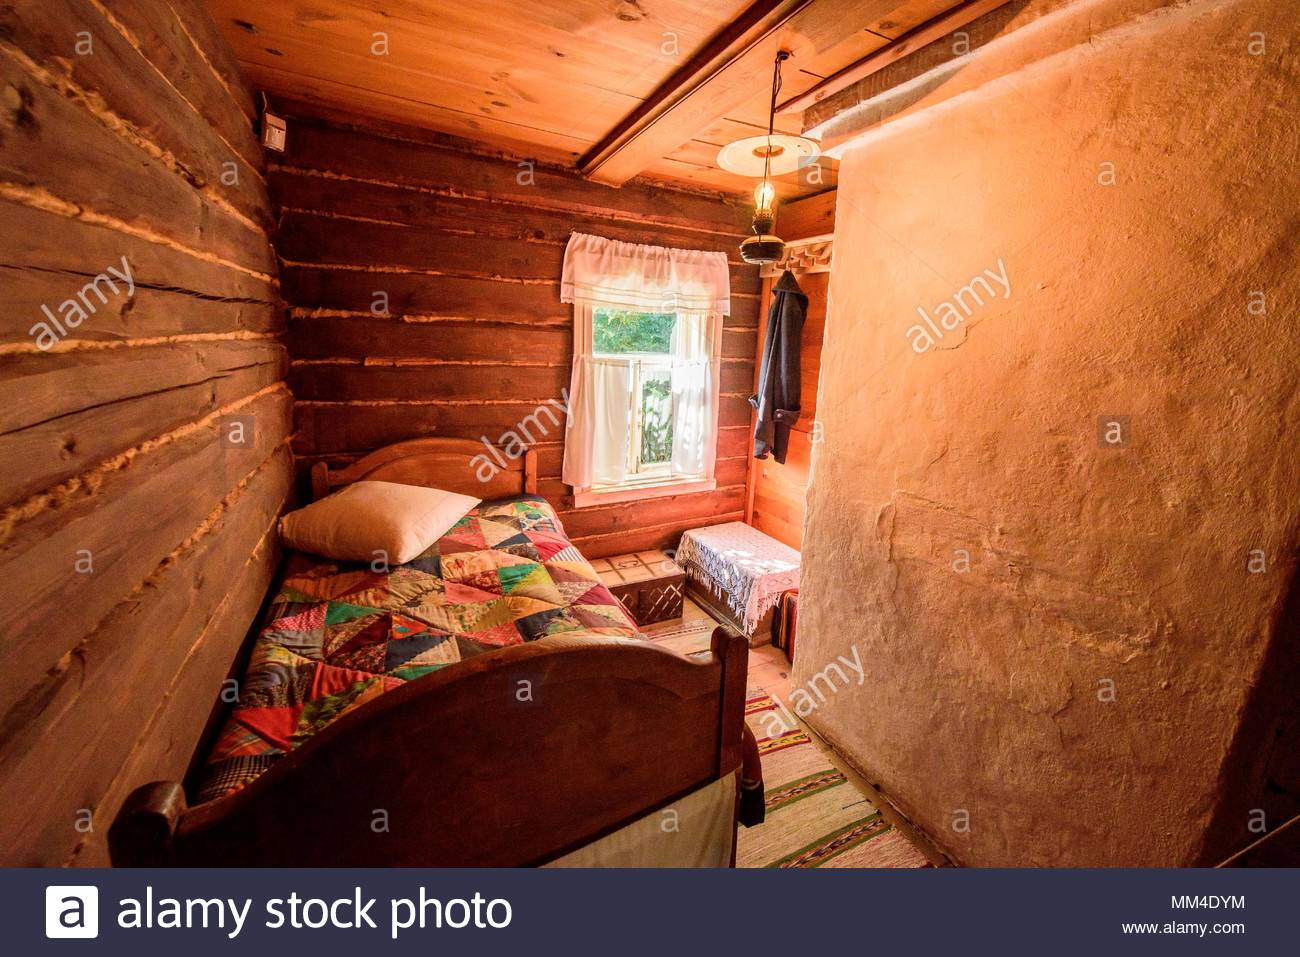 Village Konstantinovo, Ryazan region: excursions, house Yesenin 62